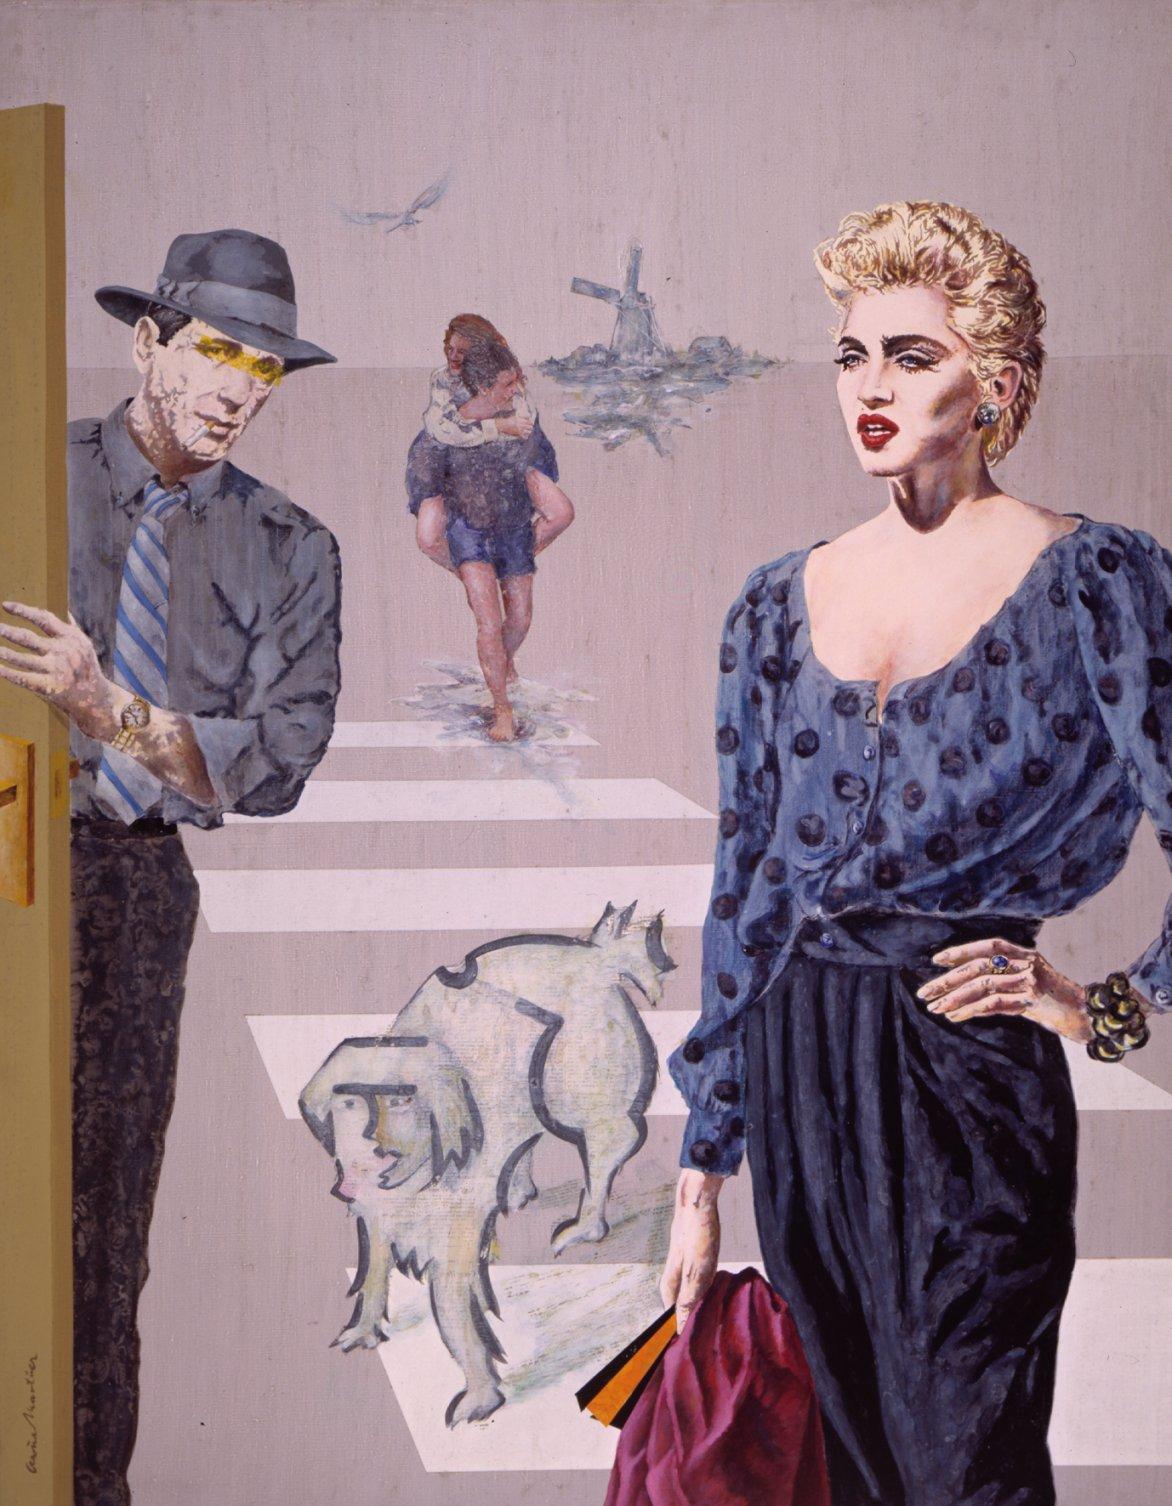 Madonna y Bogaryt (1986) - José Antonio Ocaña Martínez - ocañamartínez